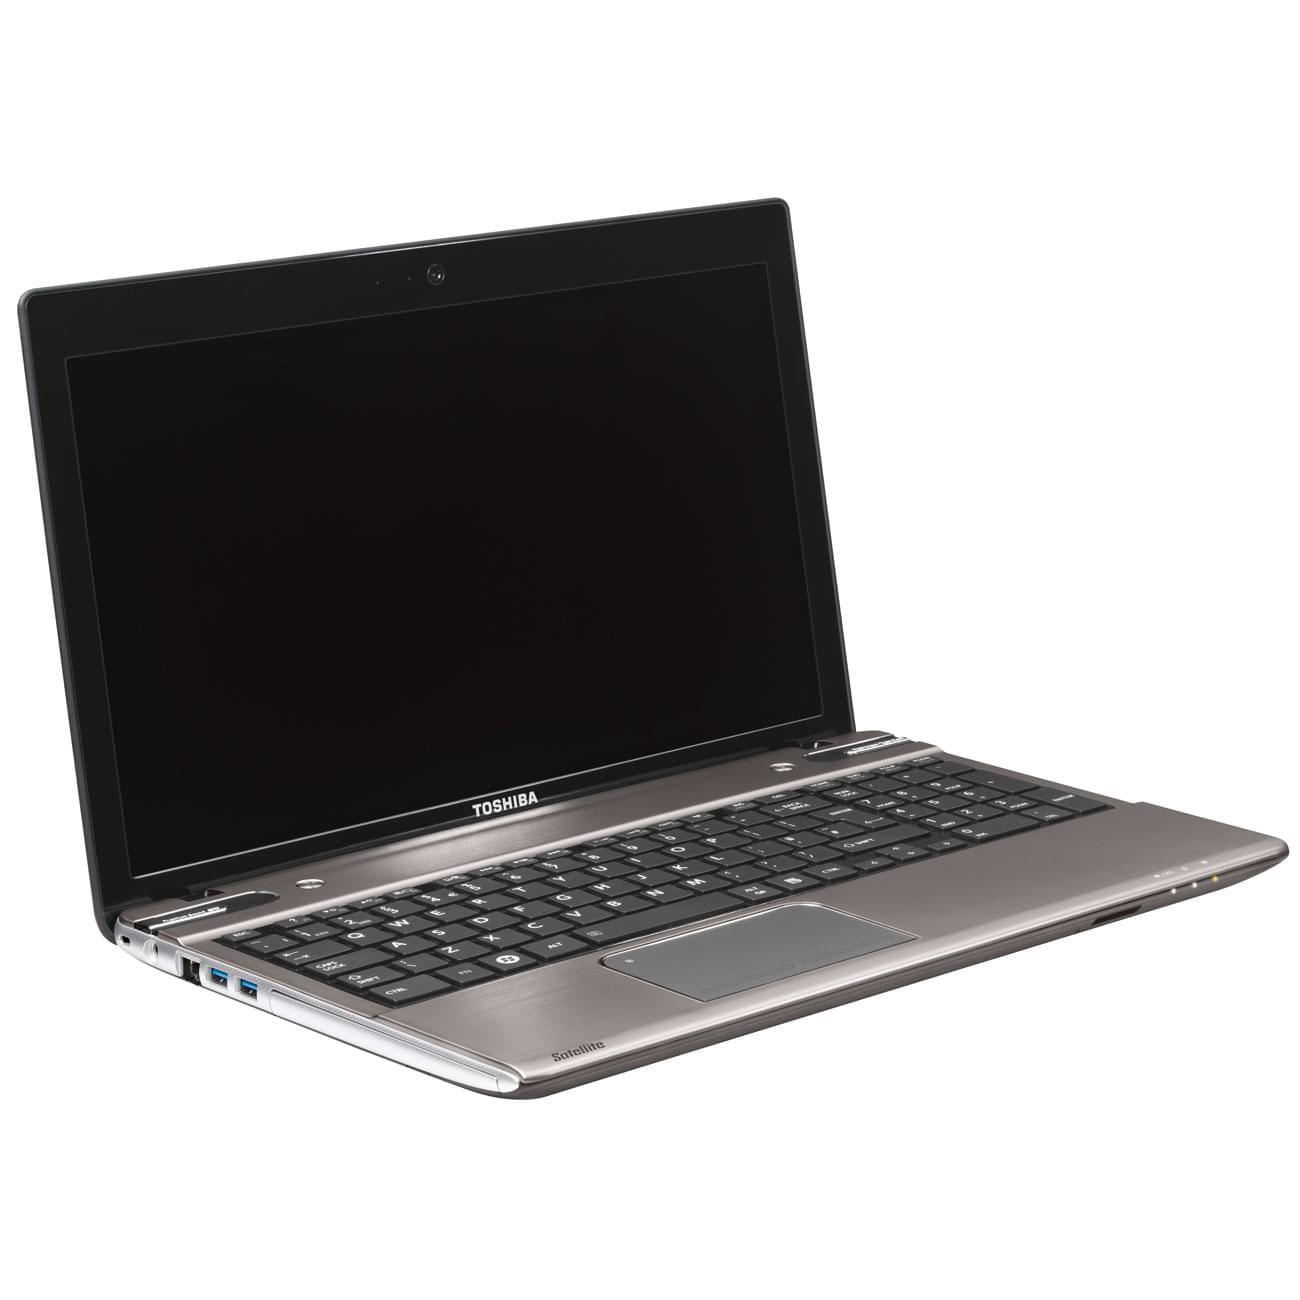 Toshiba P850-31M (PSPKFE-01E00RFR) - Achat / Vente PC portable sur Cybertek.fr - 0